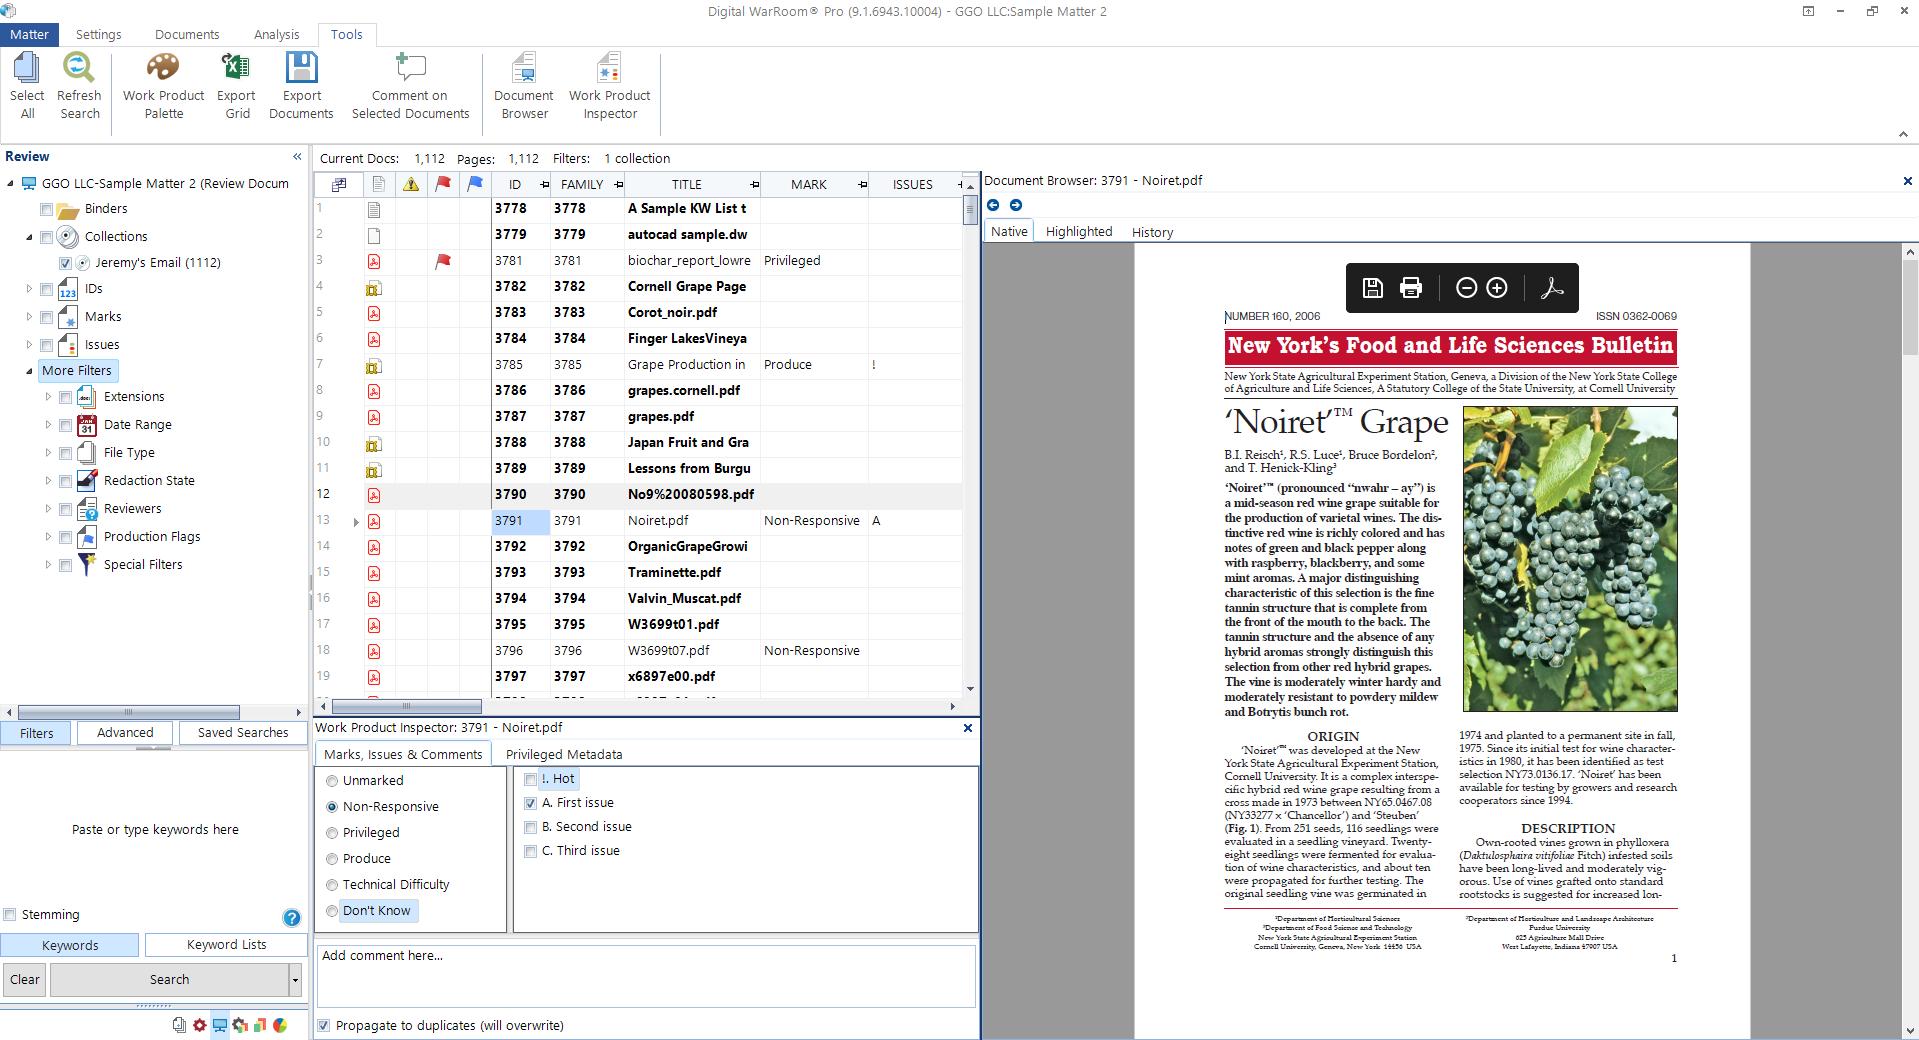 Digital WarRoom document review view